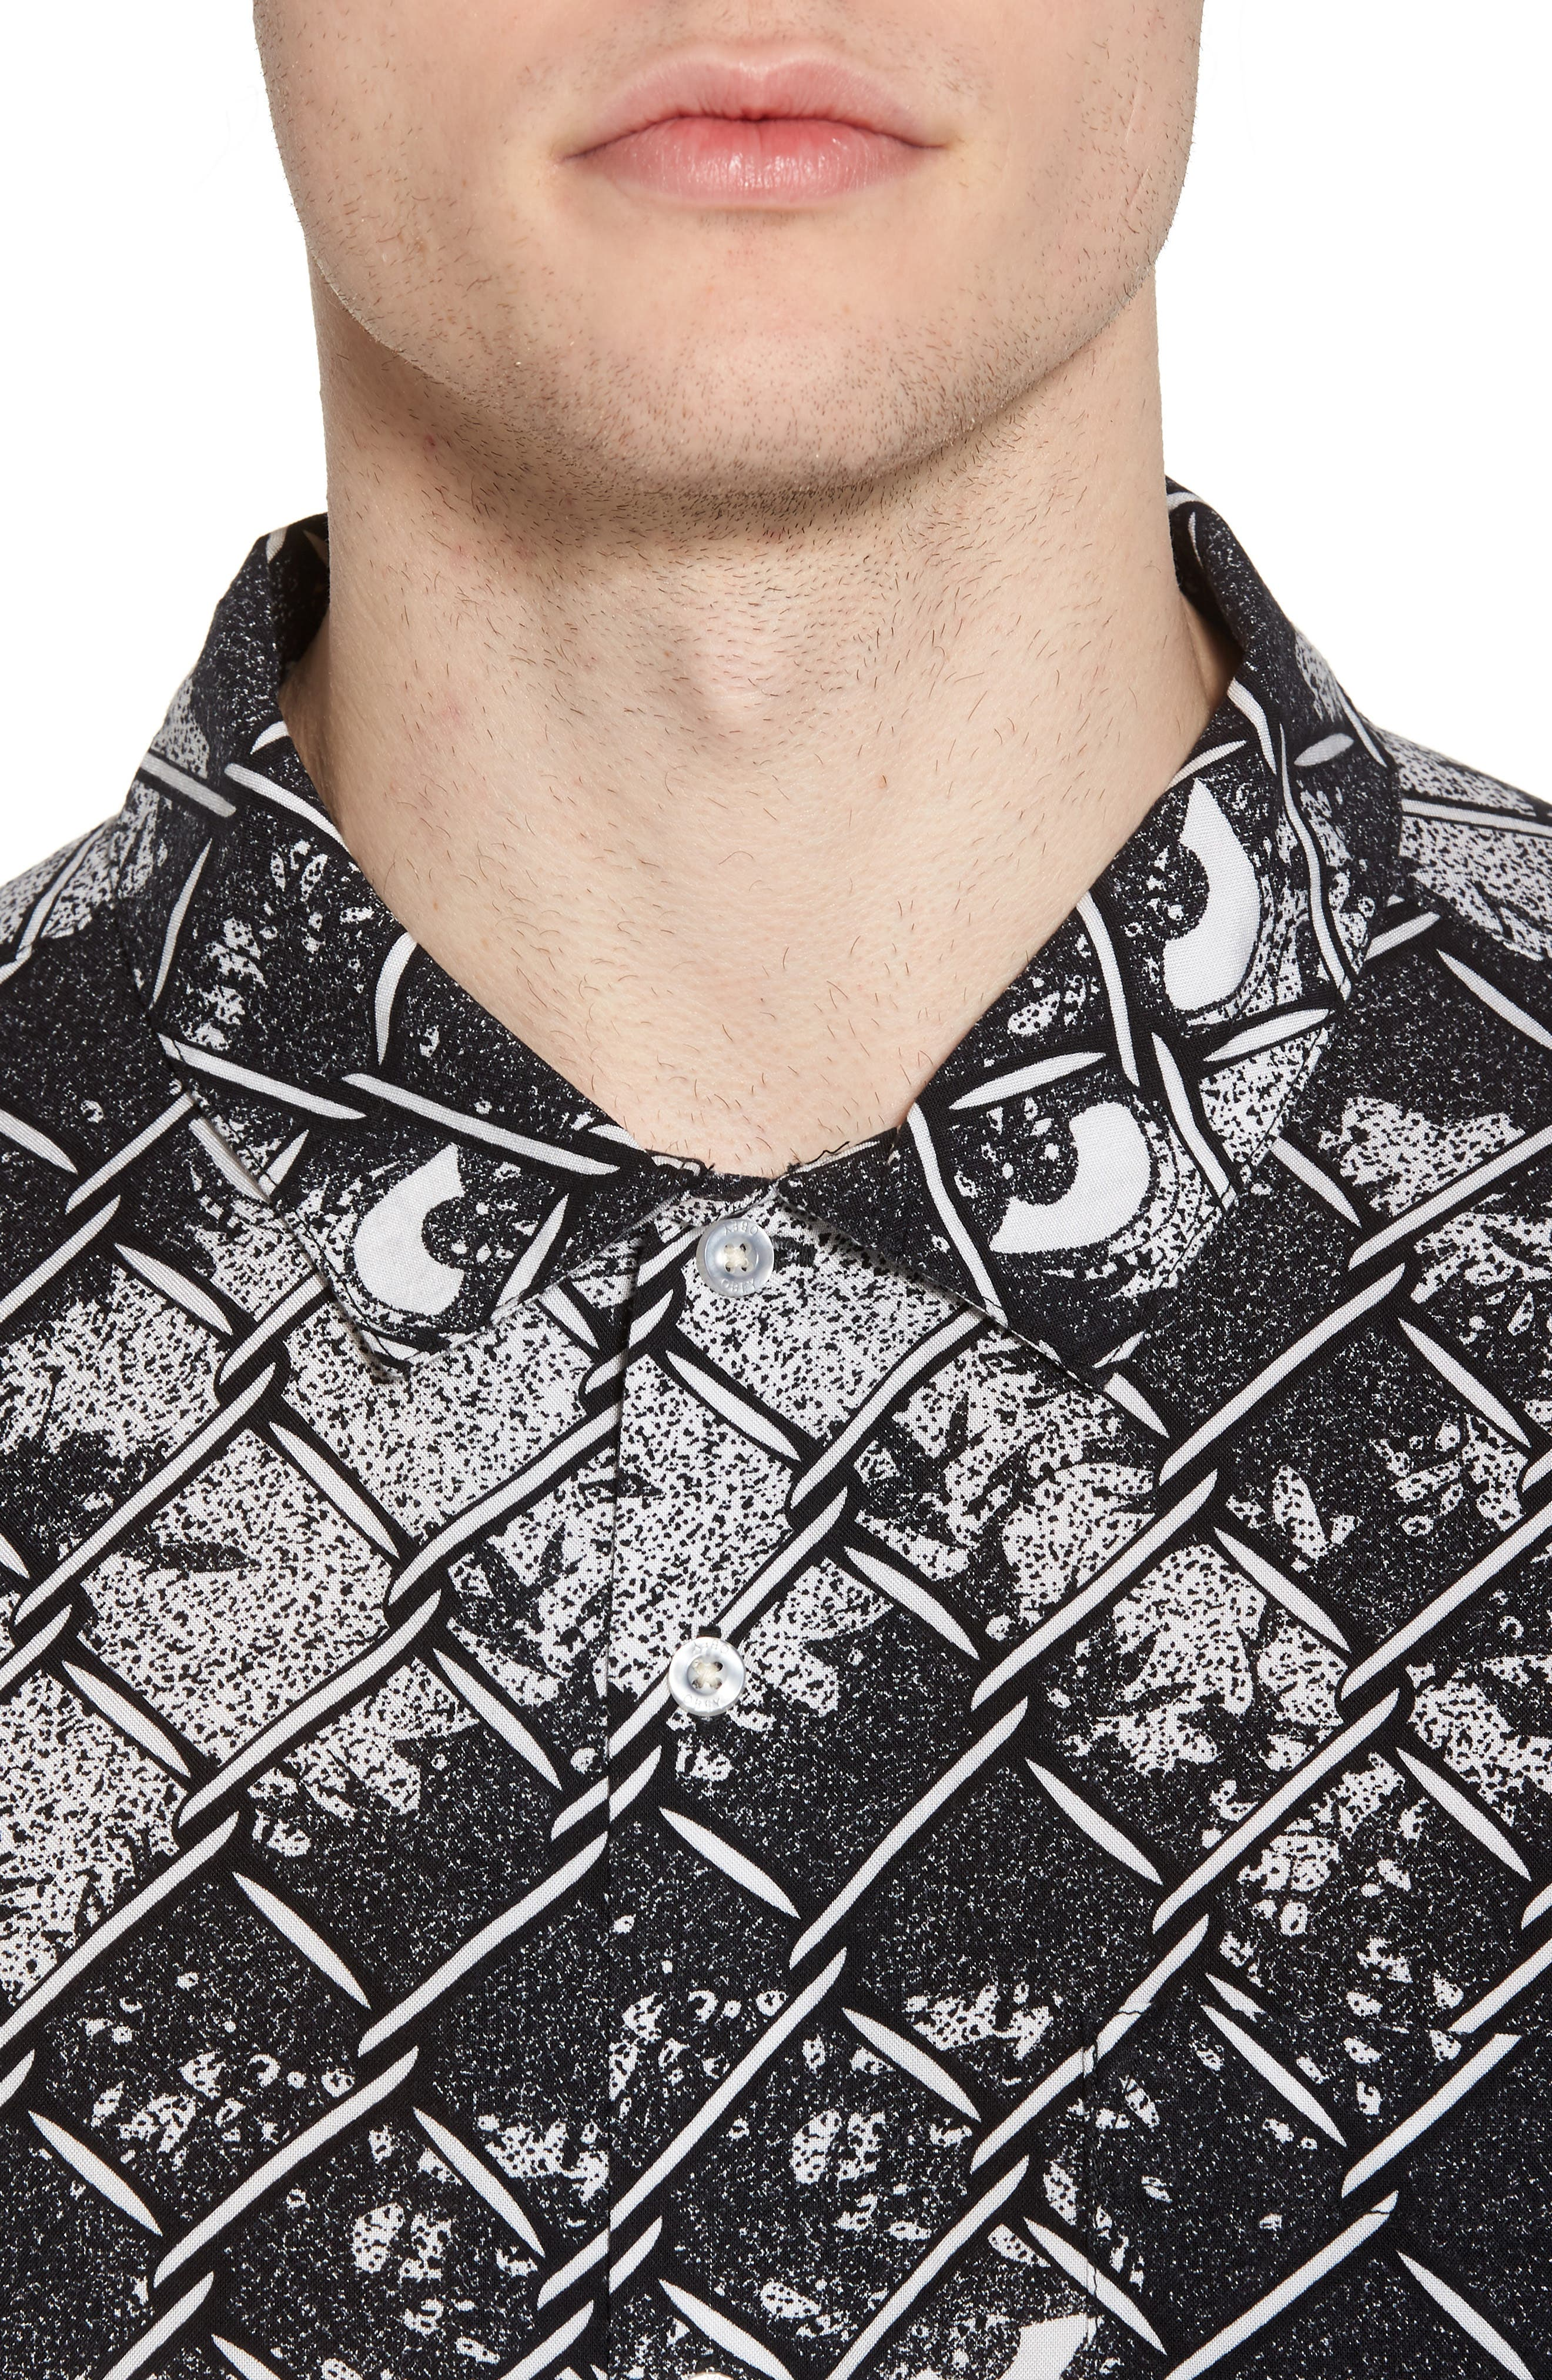 Gatekeeper Short Sleeve Shirt,                             Alternate thumbnail 4, color,                             Black Multi